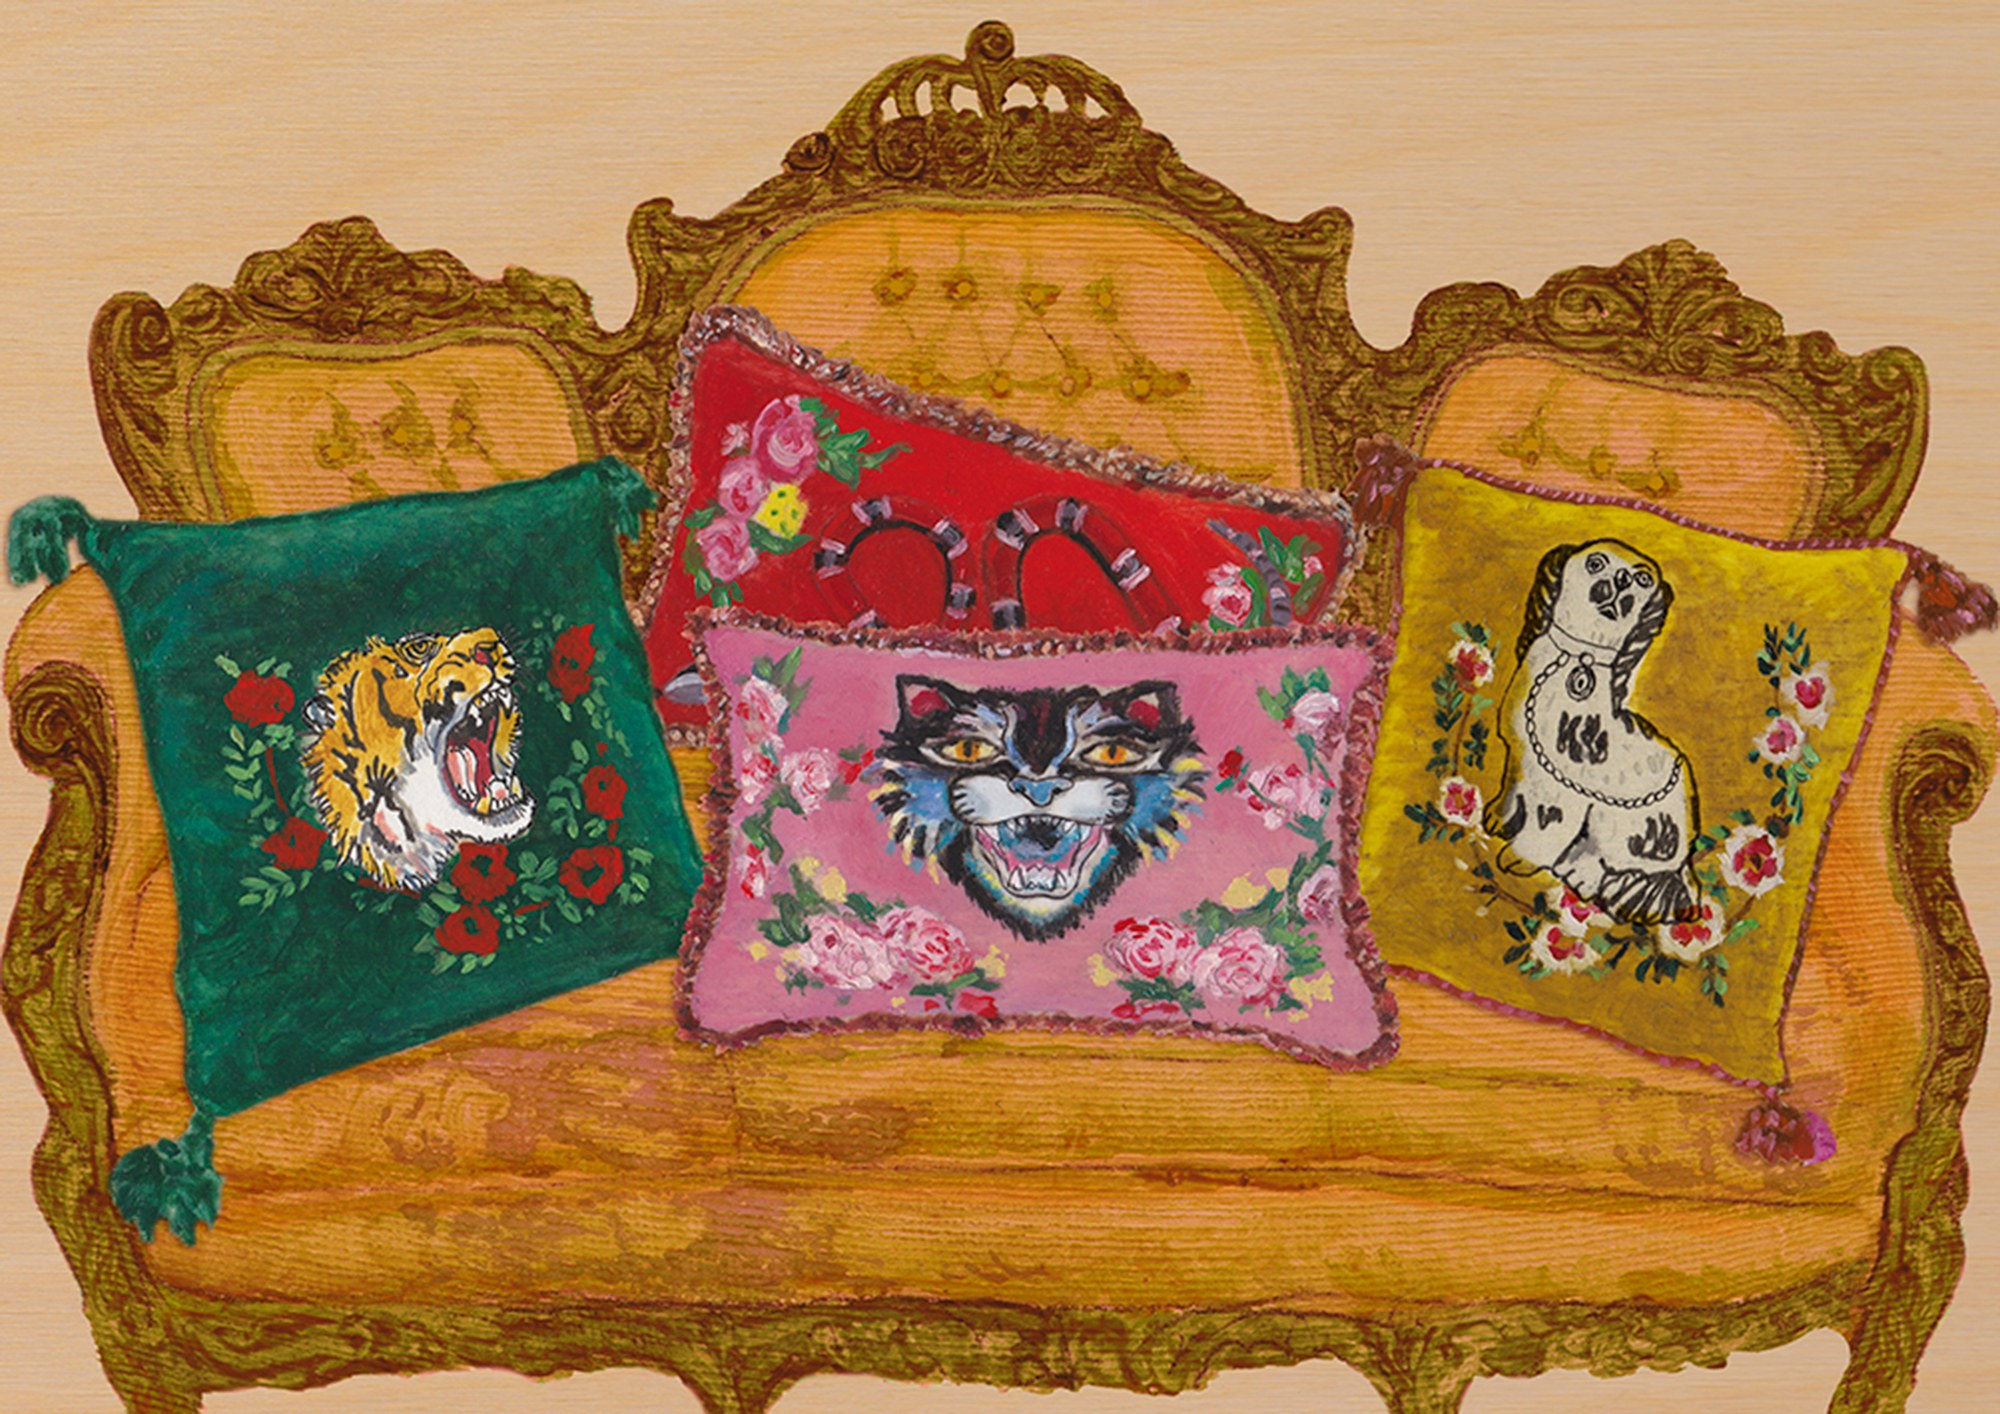 Gucci Decor Koleksiyonunu Keşfedin!